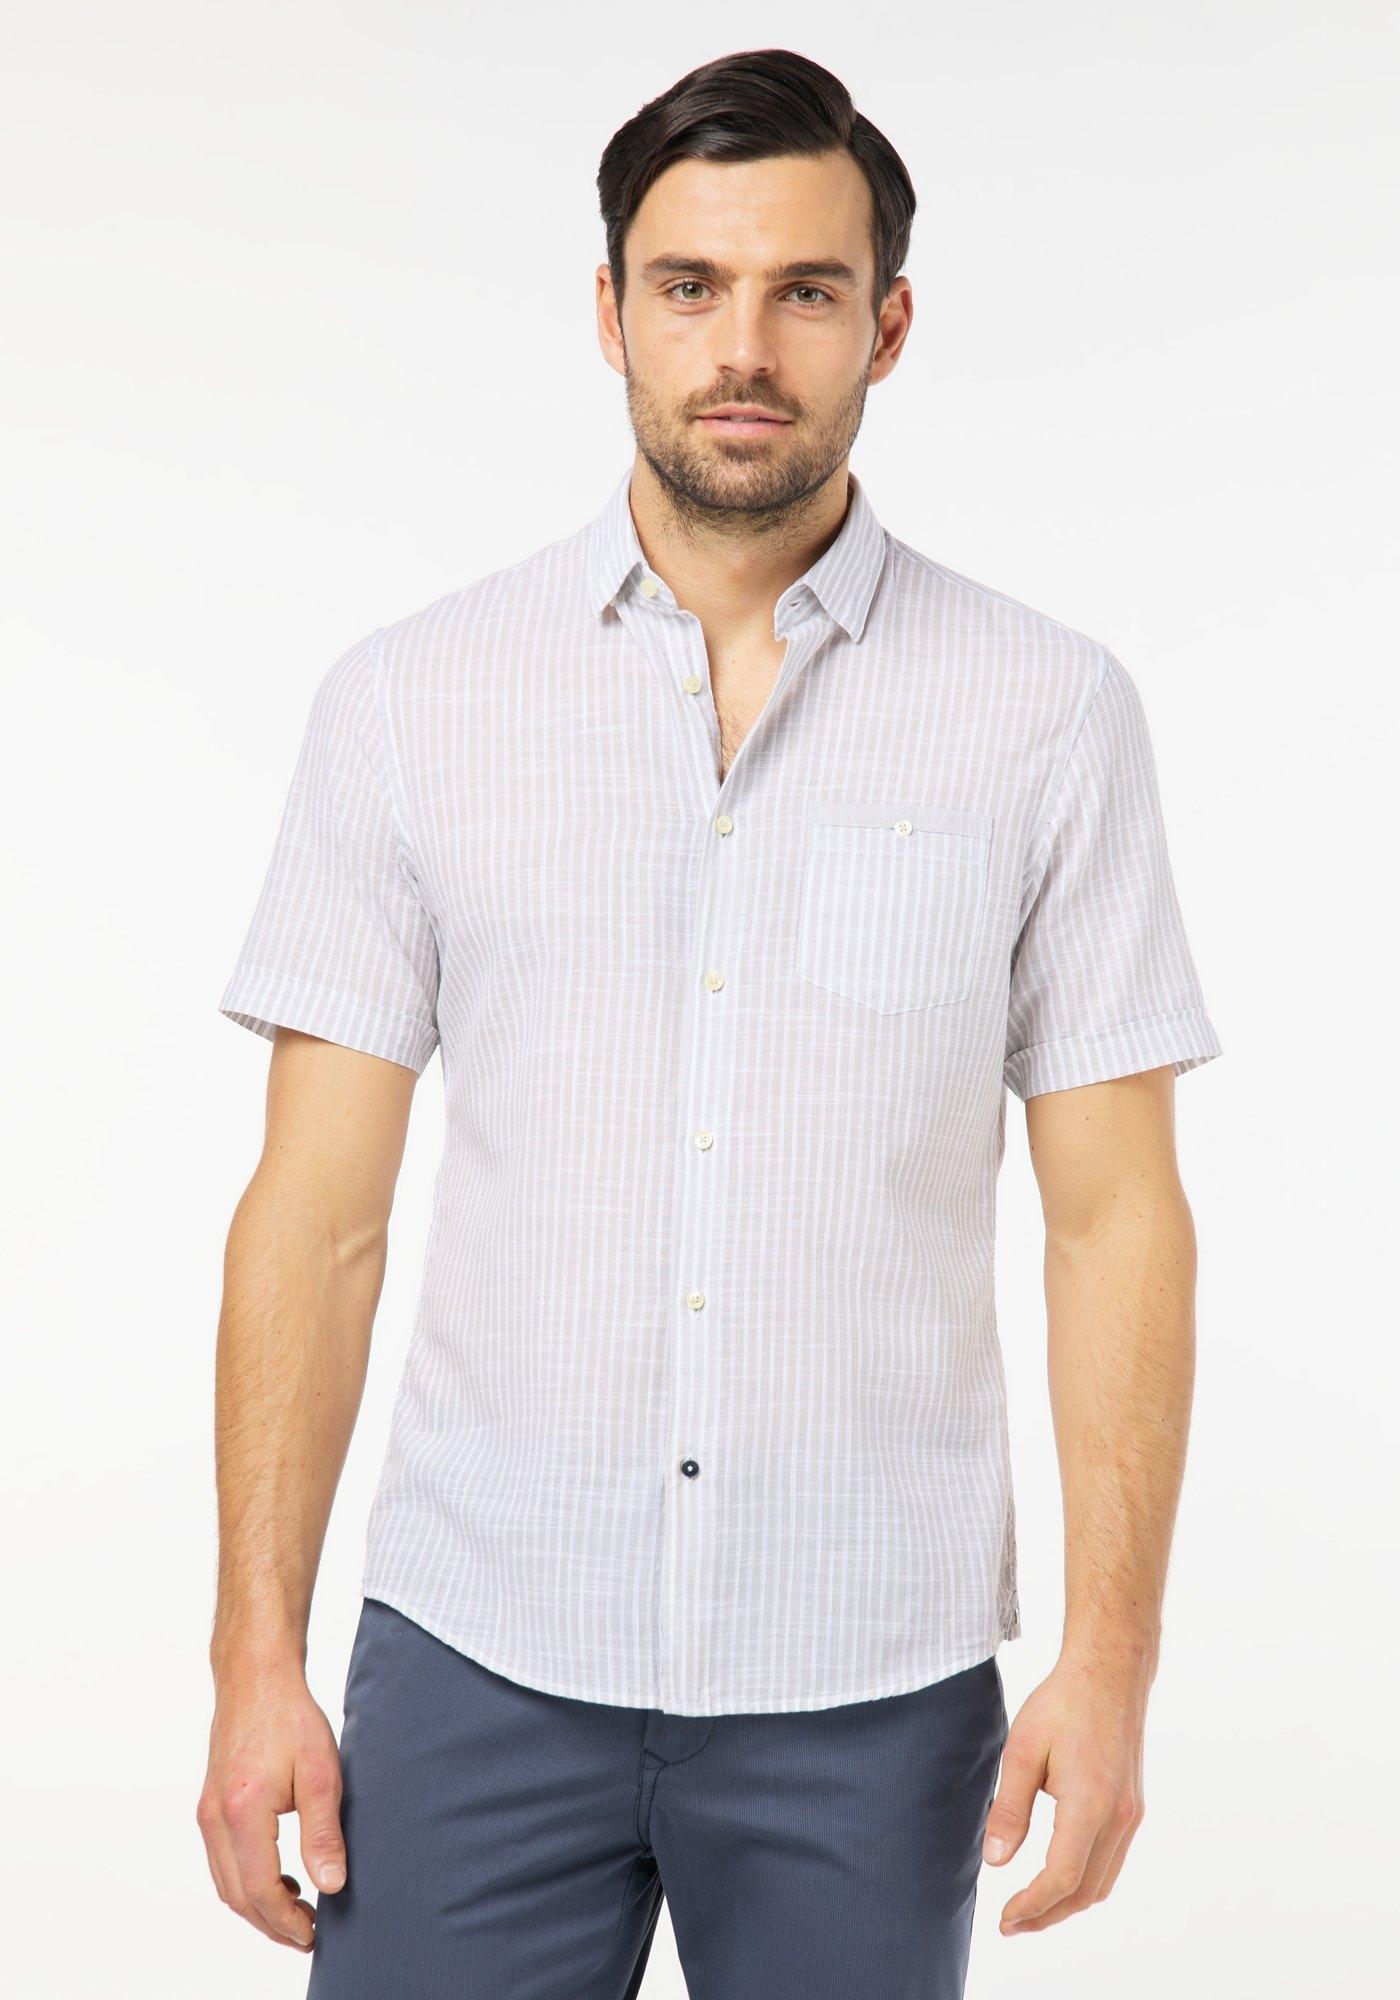 Pierre Cardin overhemd met korte mouwen nu online bestellen